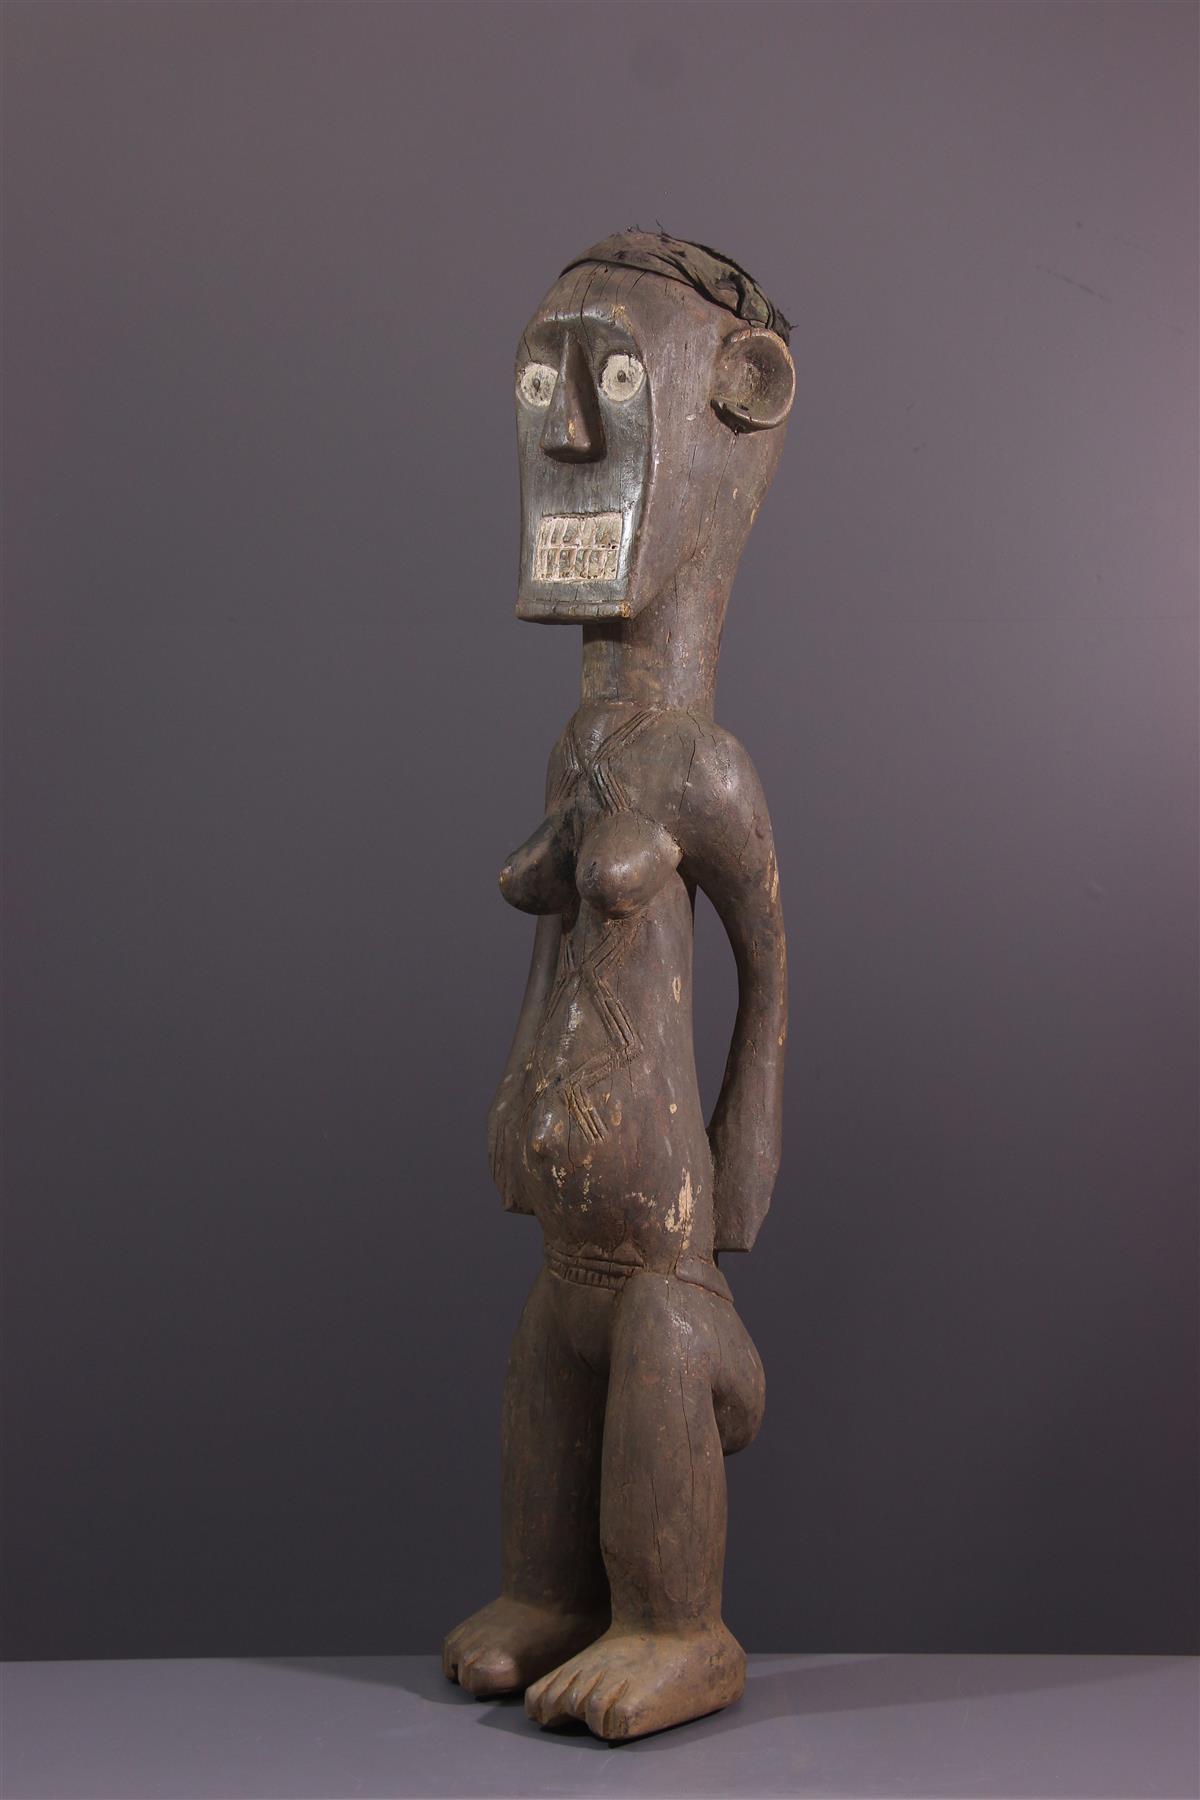 Bafo statue - Tribal art